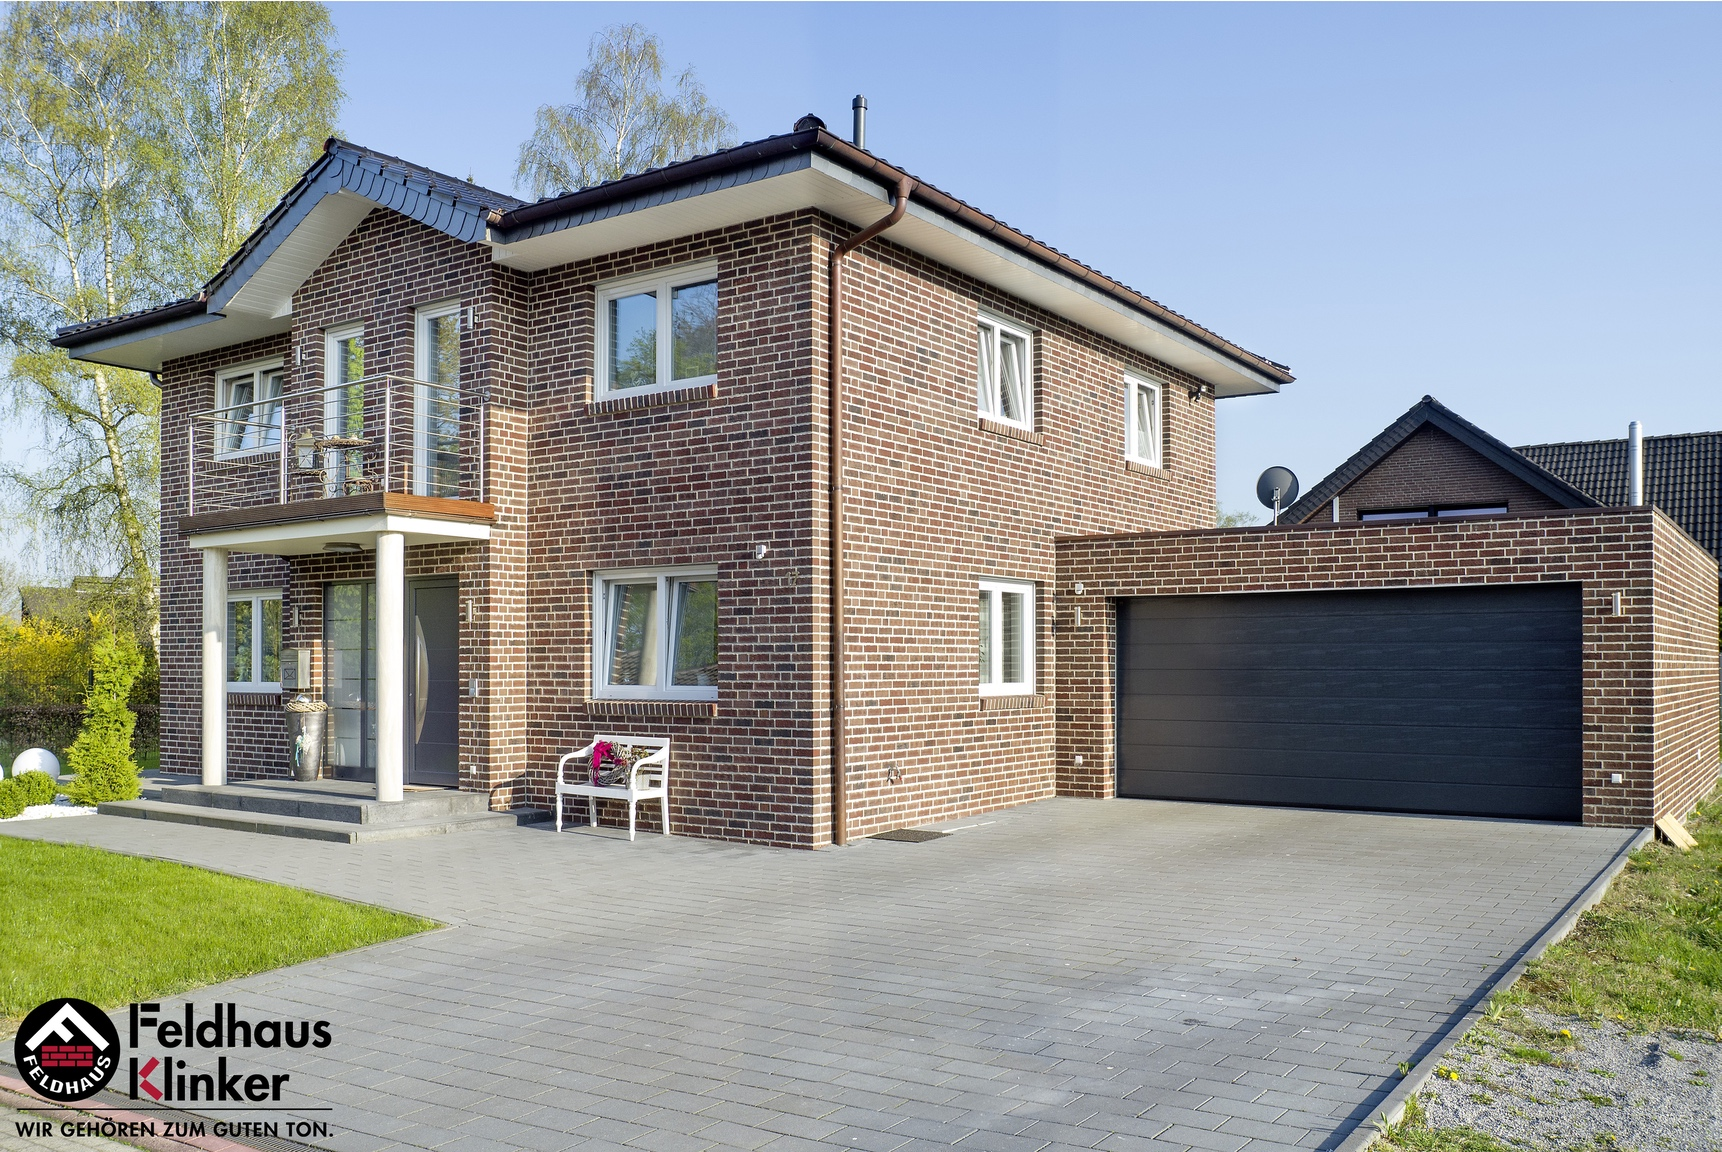 663 Feldhaus Klinker Sintra6